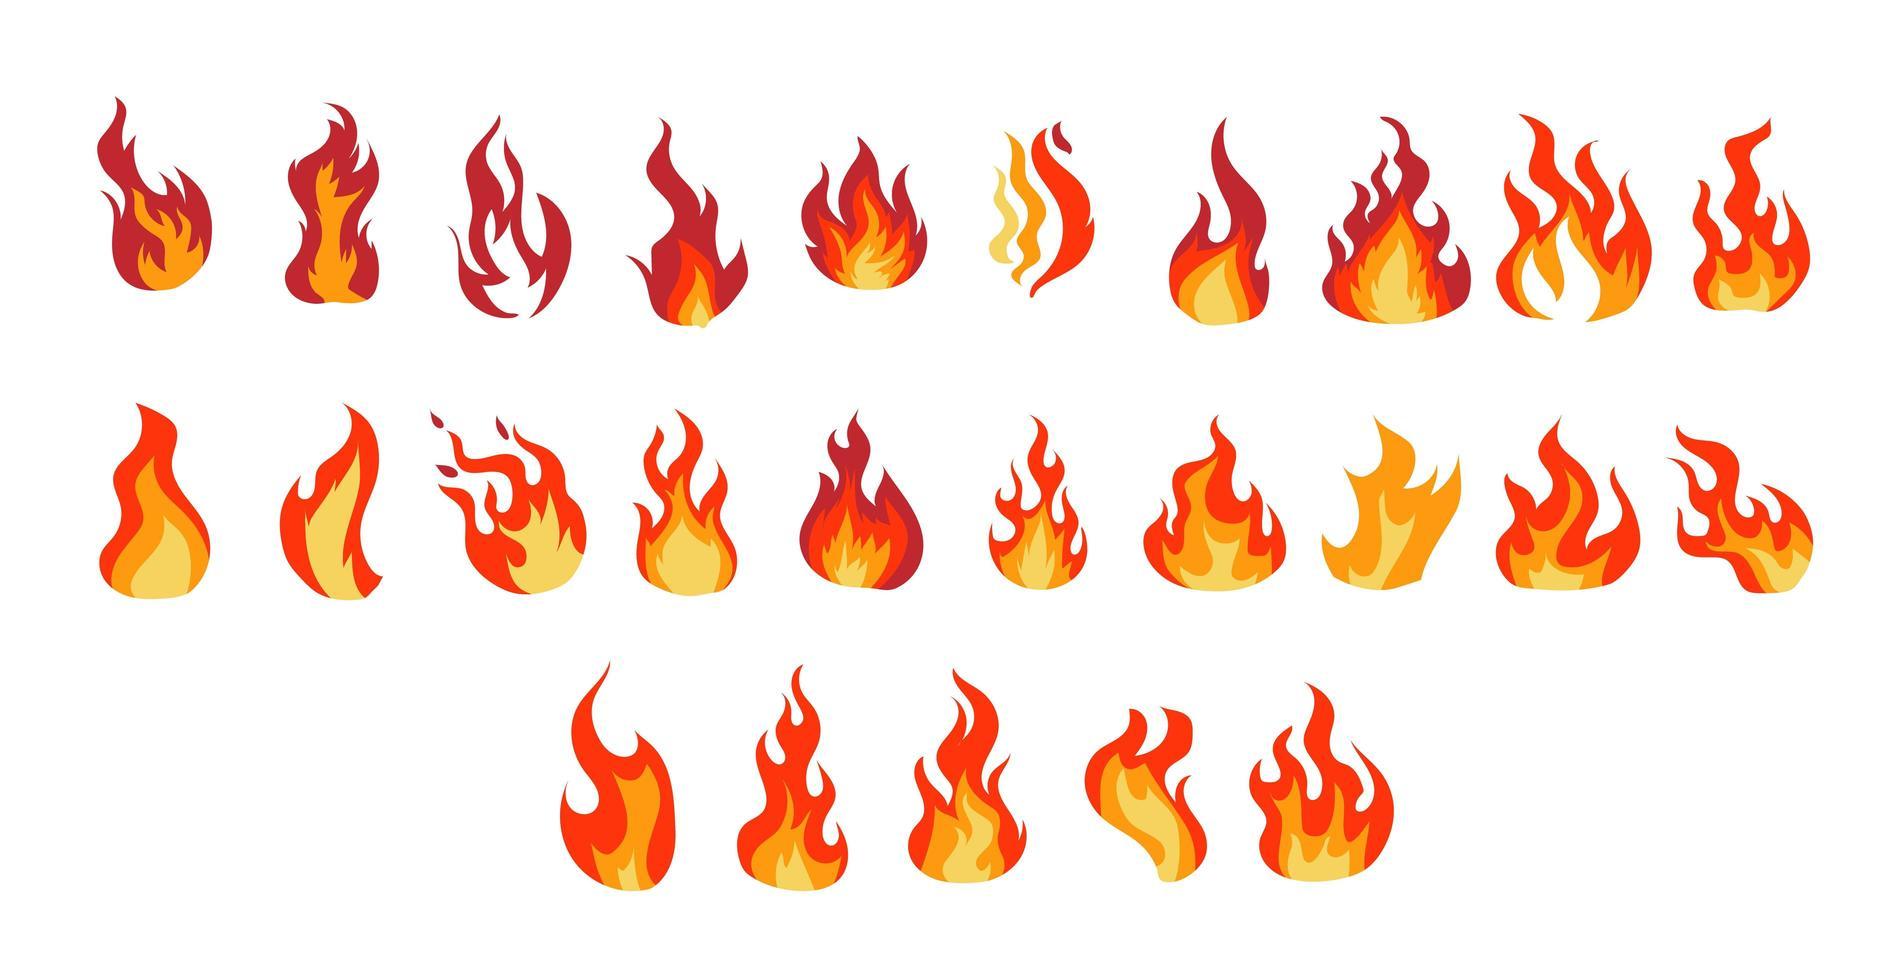 Jeu De Dessin Anime De Flammes De Feu Telecharger Vectoriel